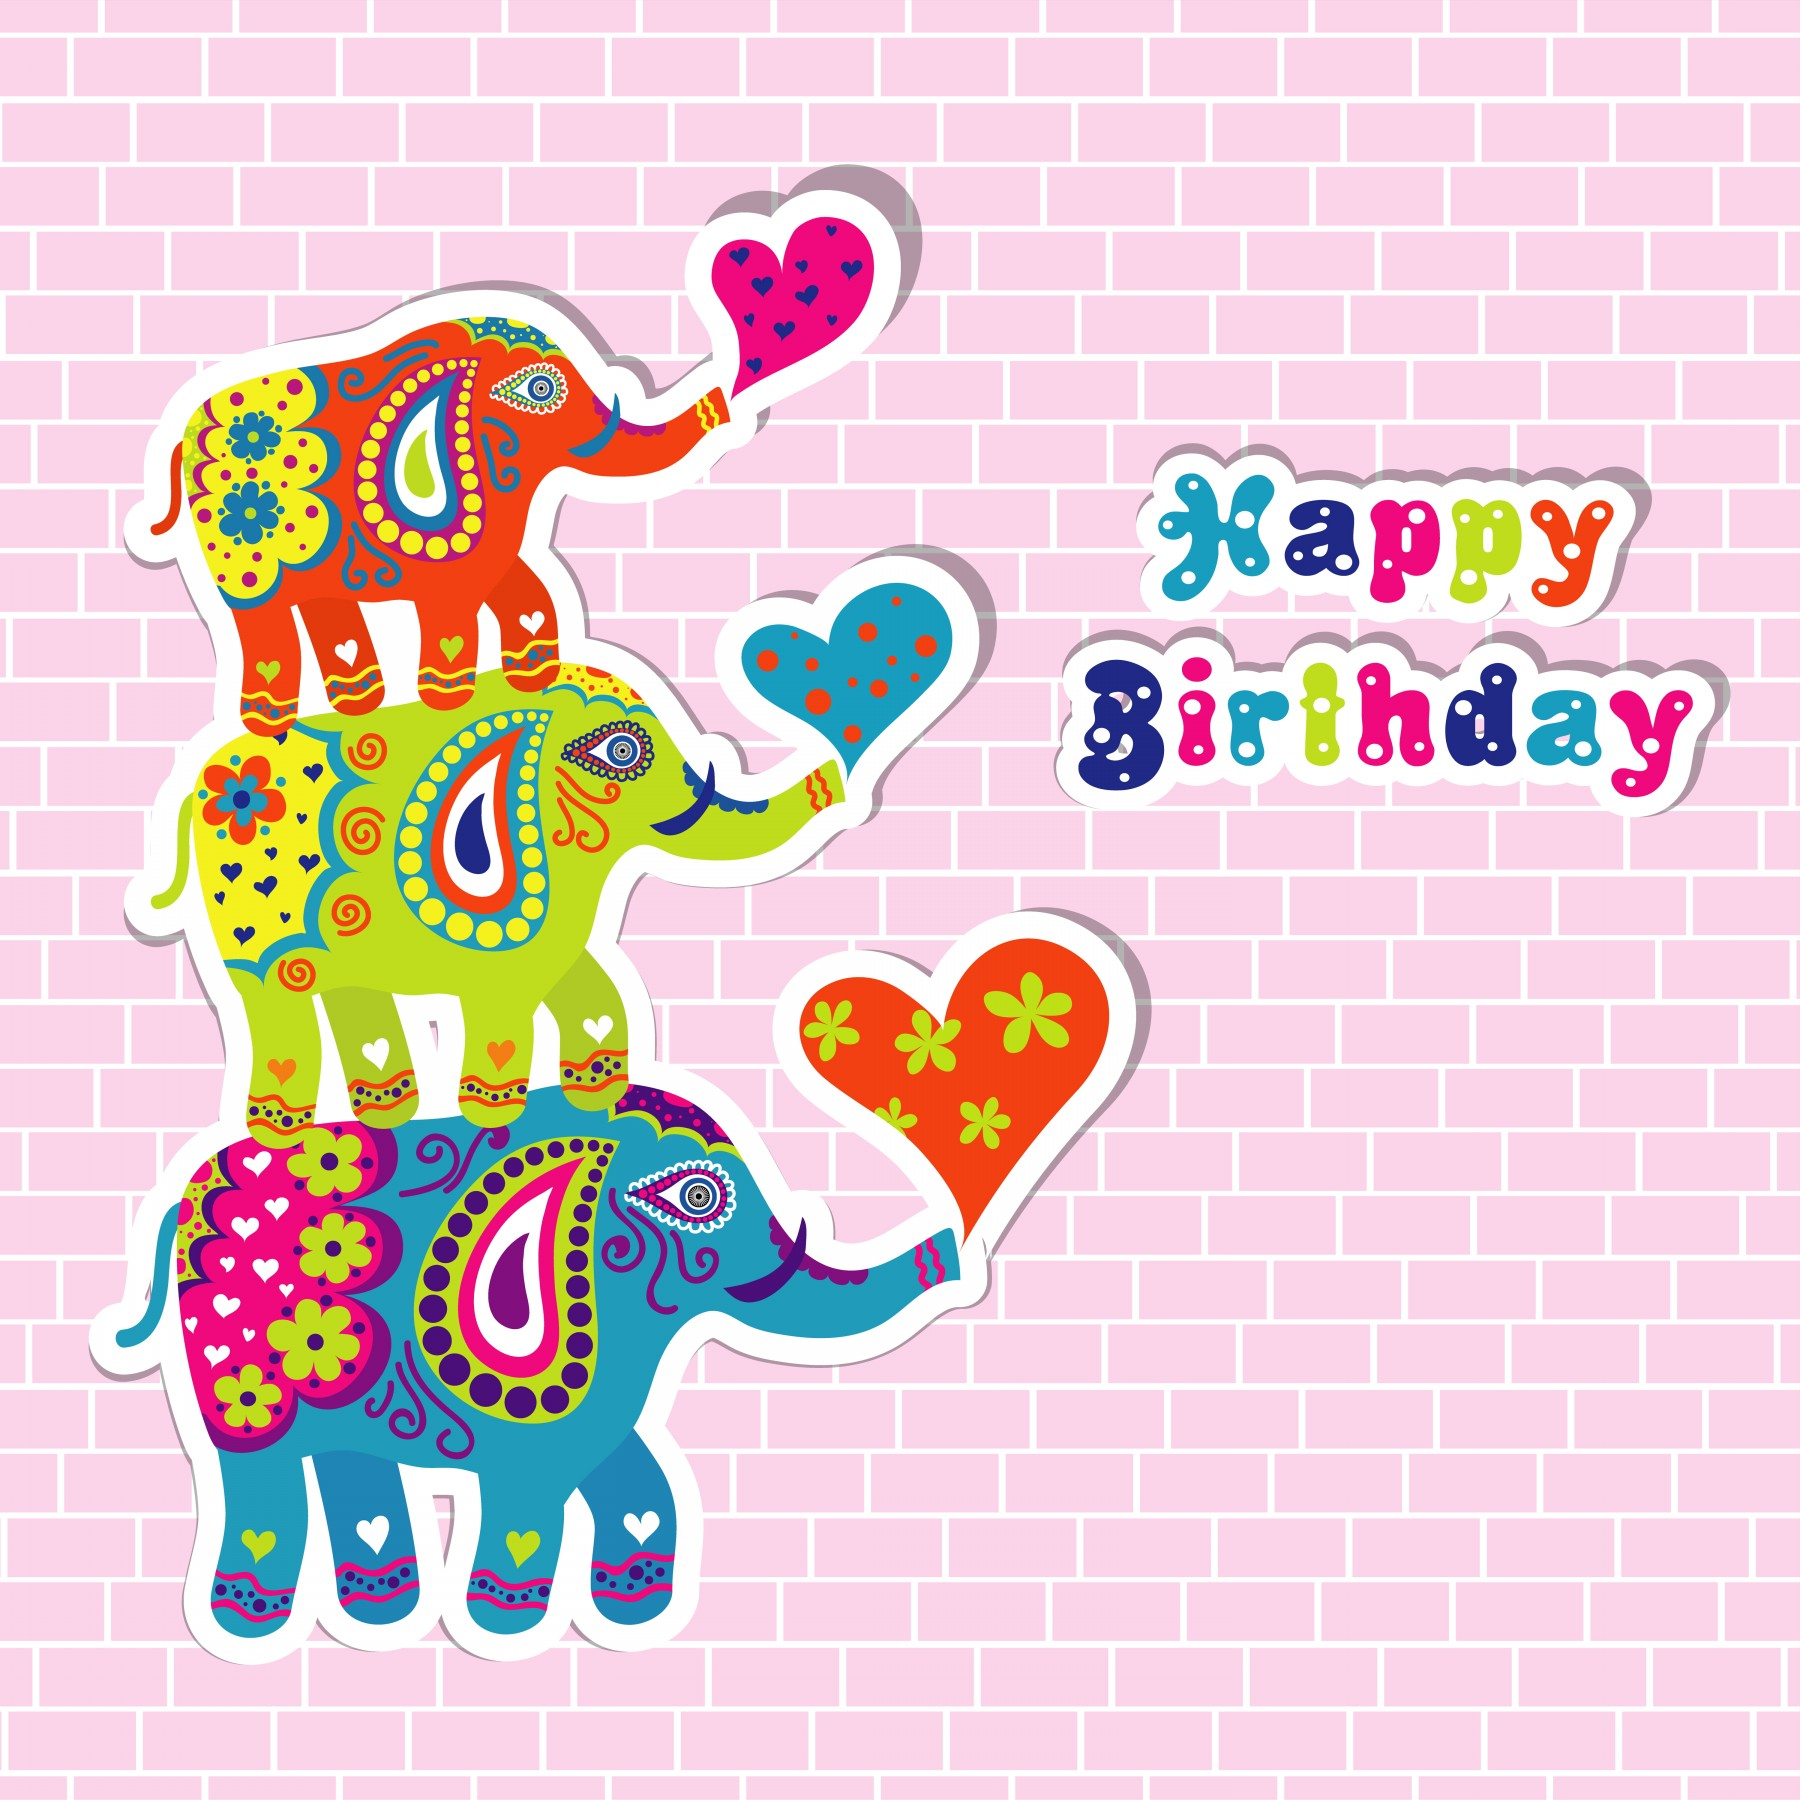 15 Happy Birthday Cards New Designs Elsoar – Happy Birthday Video Card